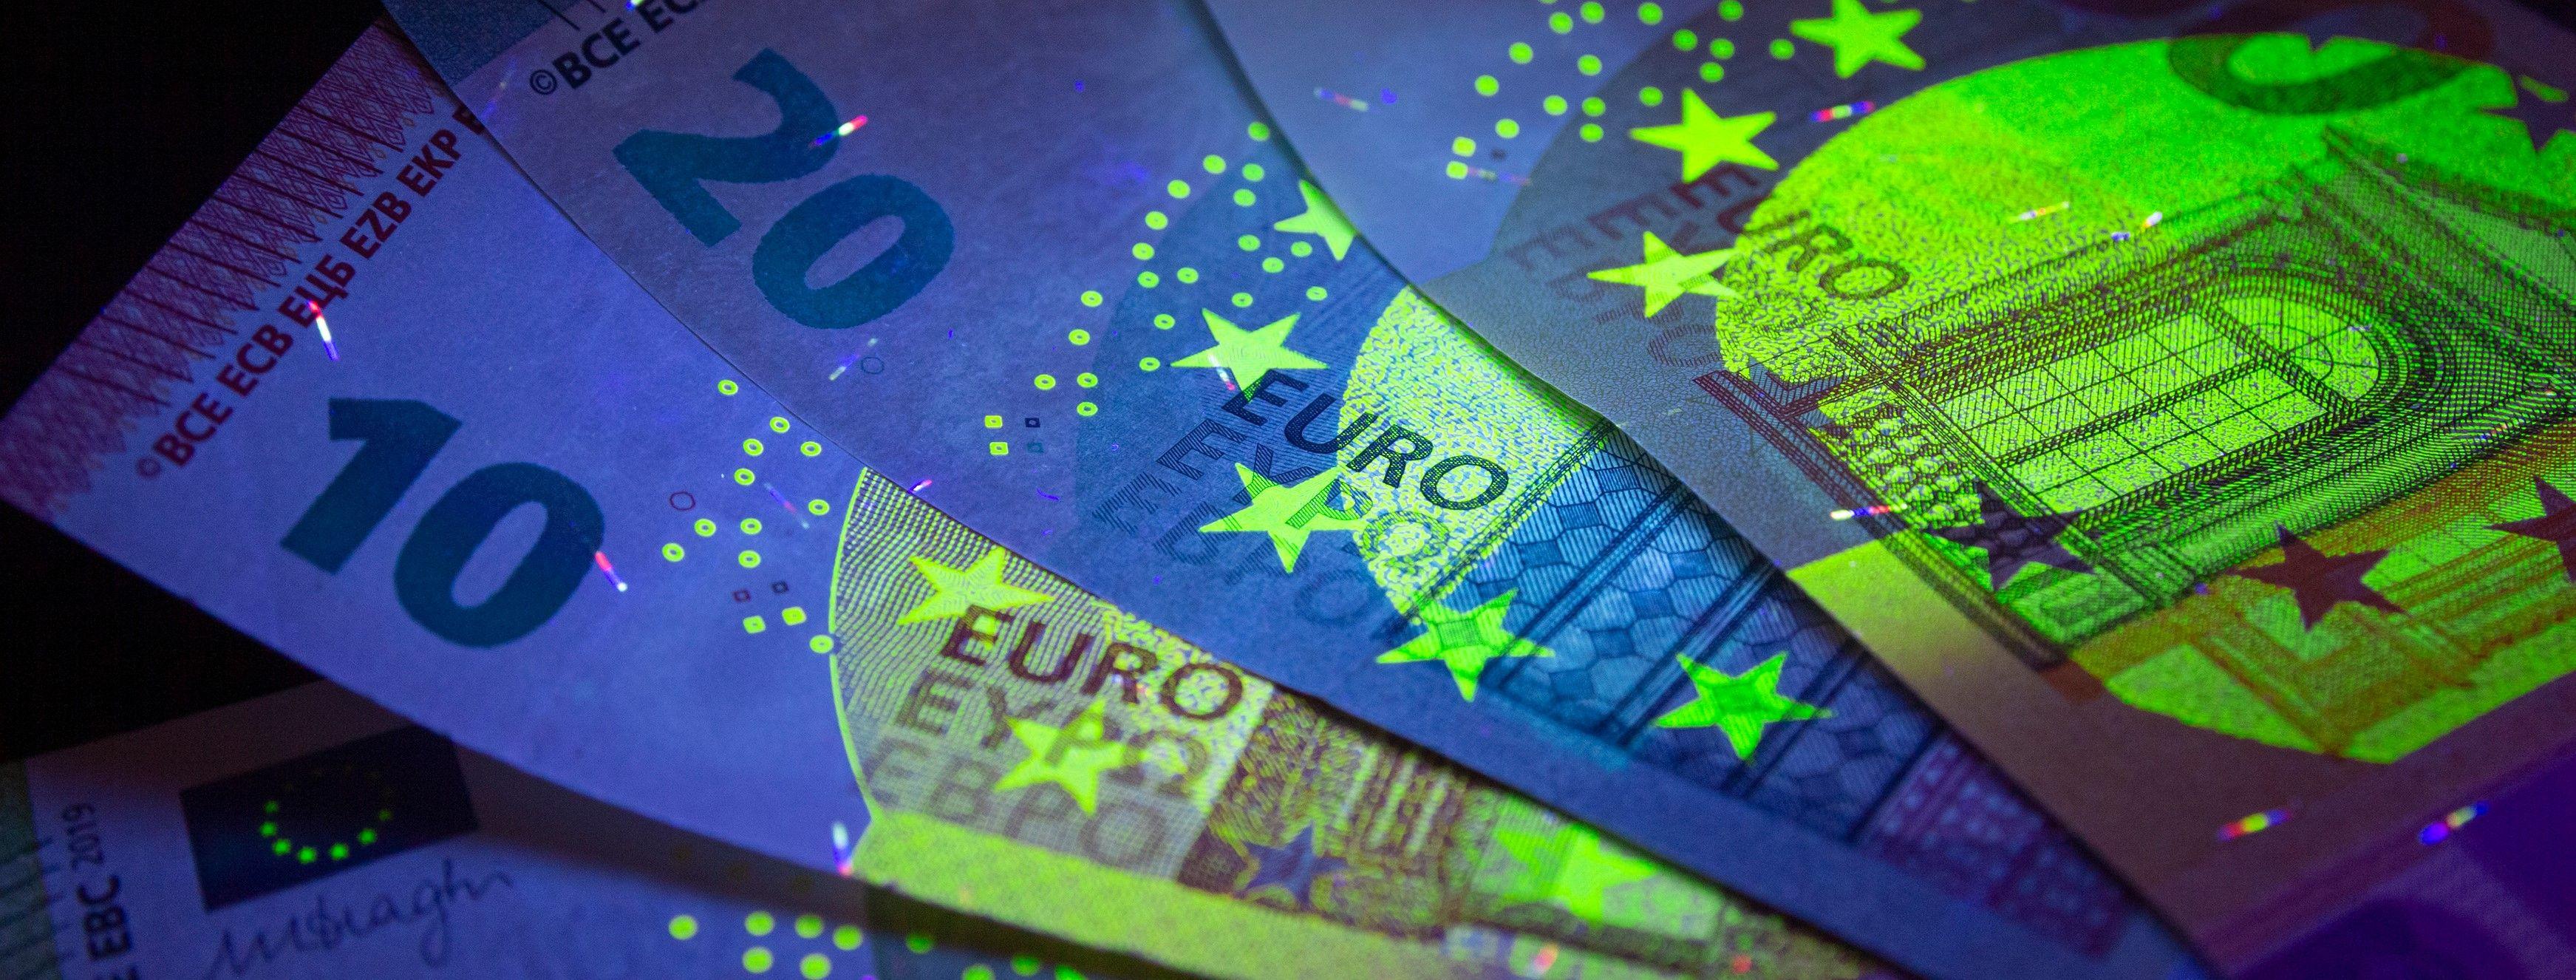 EuroCurrencyInUvLightProtection.euroInUvLight.euroCurrency.jpg